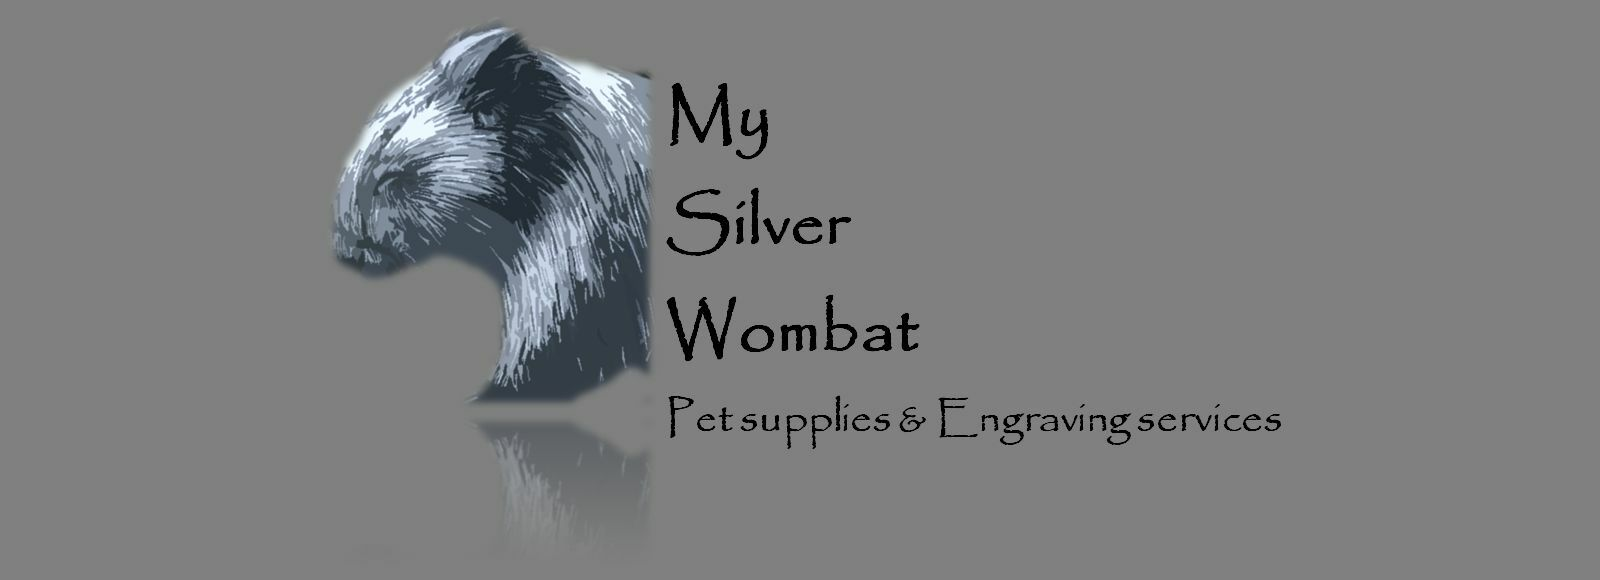 mysilverwombat